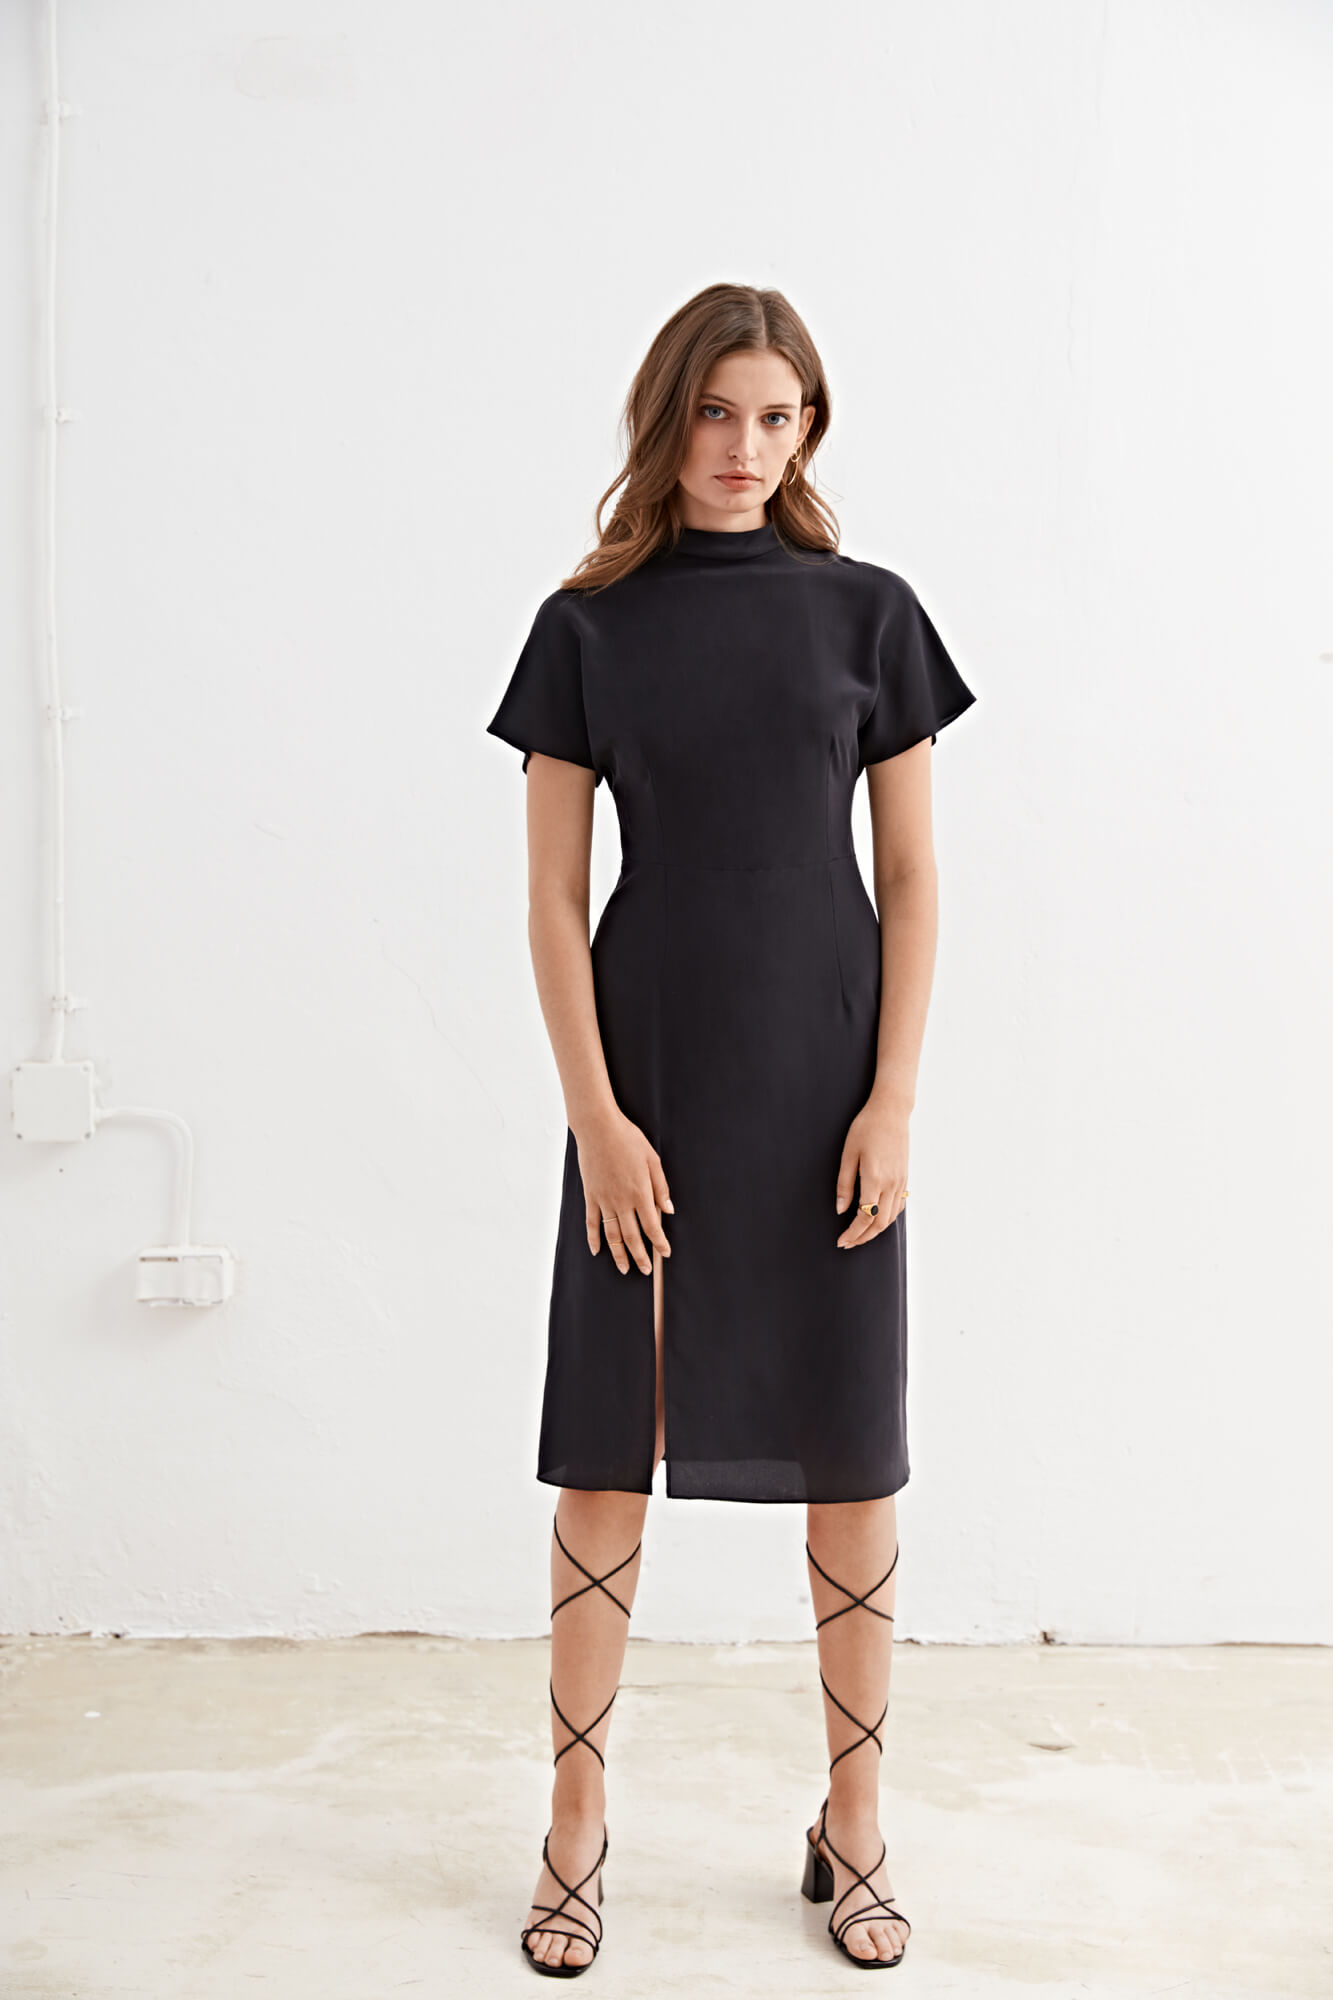 alex ko fashion brand for women